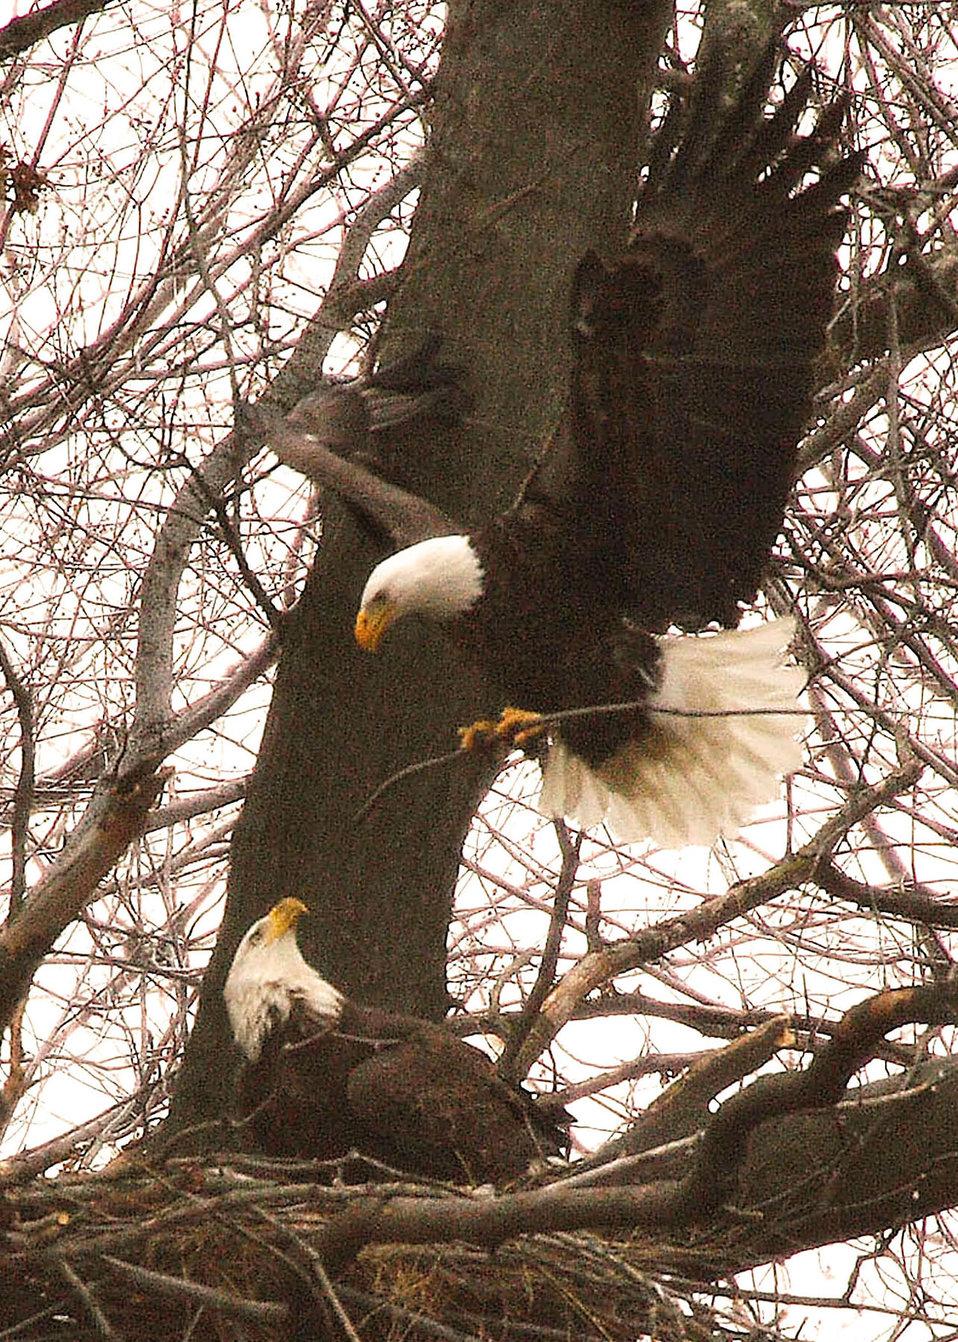 Bald eagle at its nest